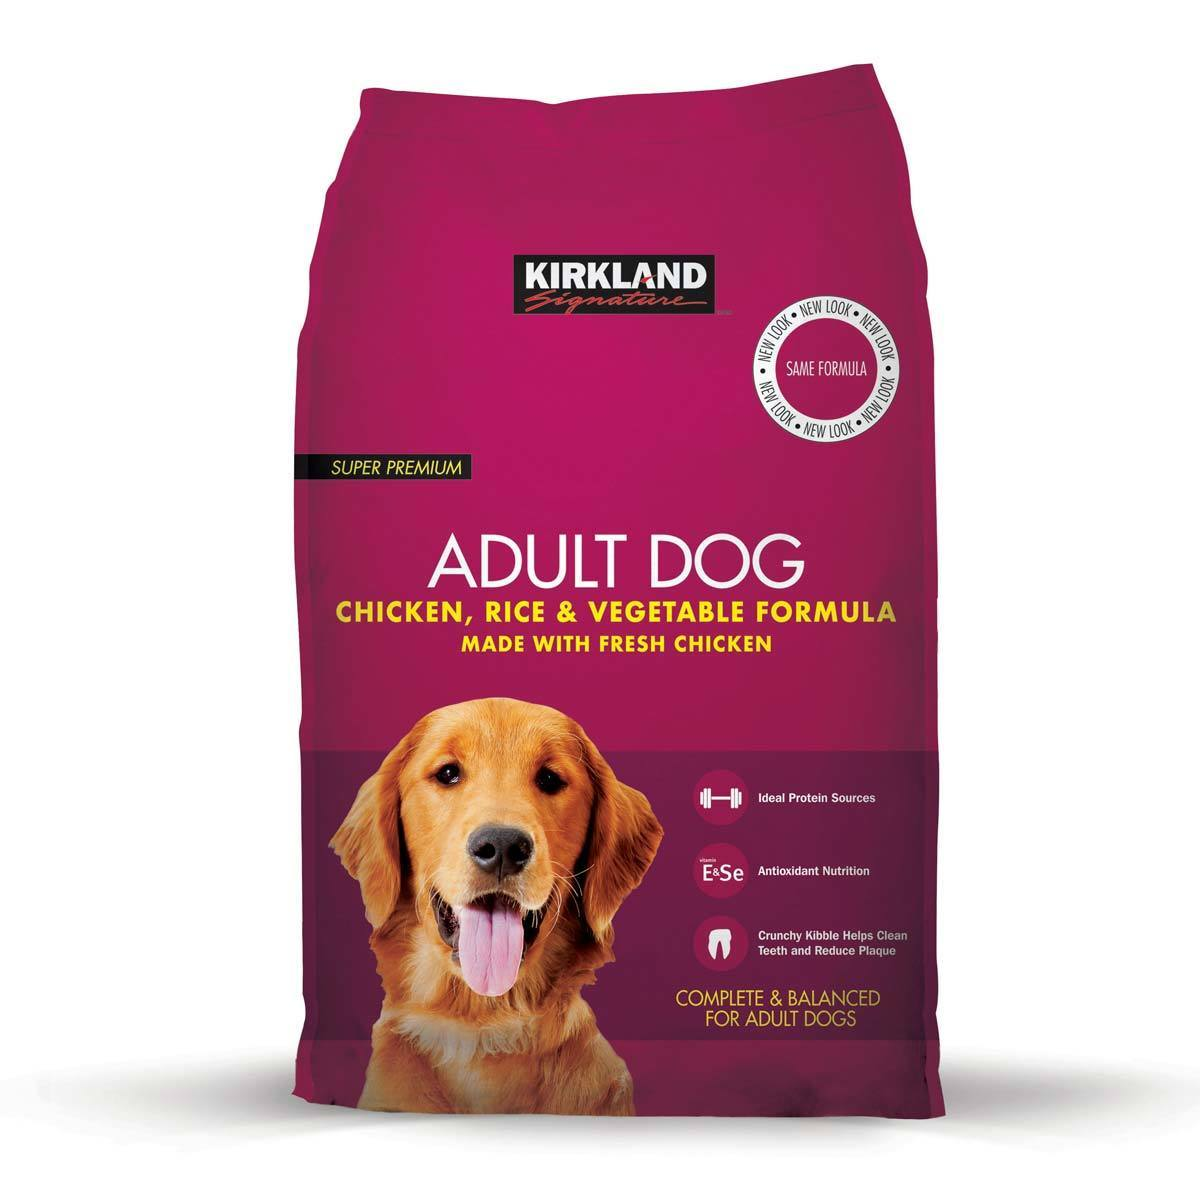 Kirkland Signature Super Premium Adult Complete Dog Food Chicken Rice Vegetable Formula 12kg Costco Uk